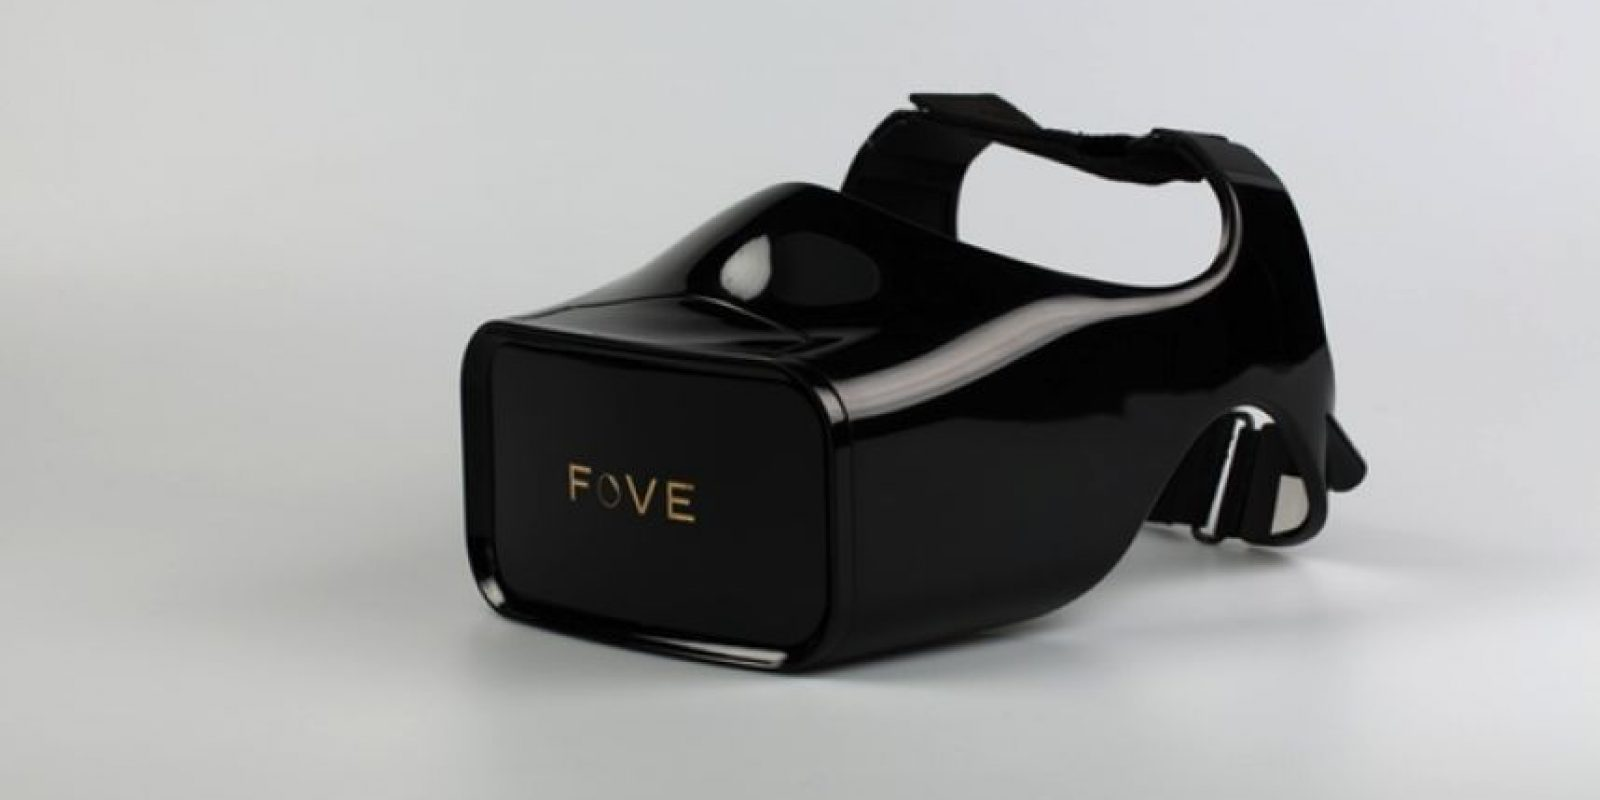 Habrá edición en negro Foto:FOVE / Kickstarter